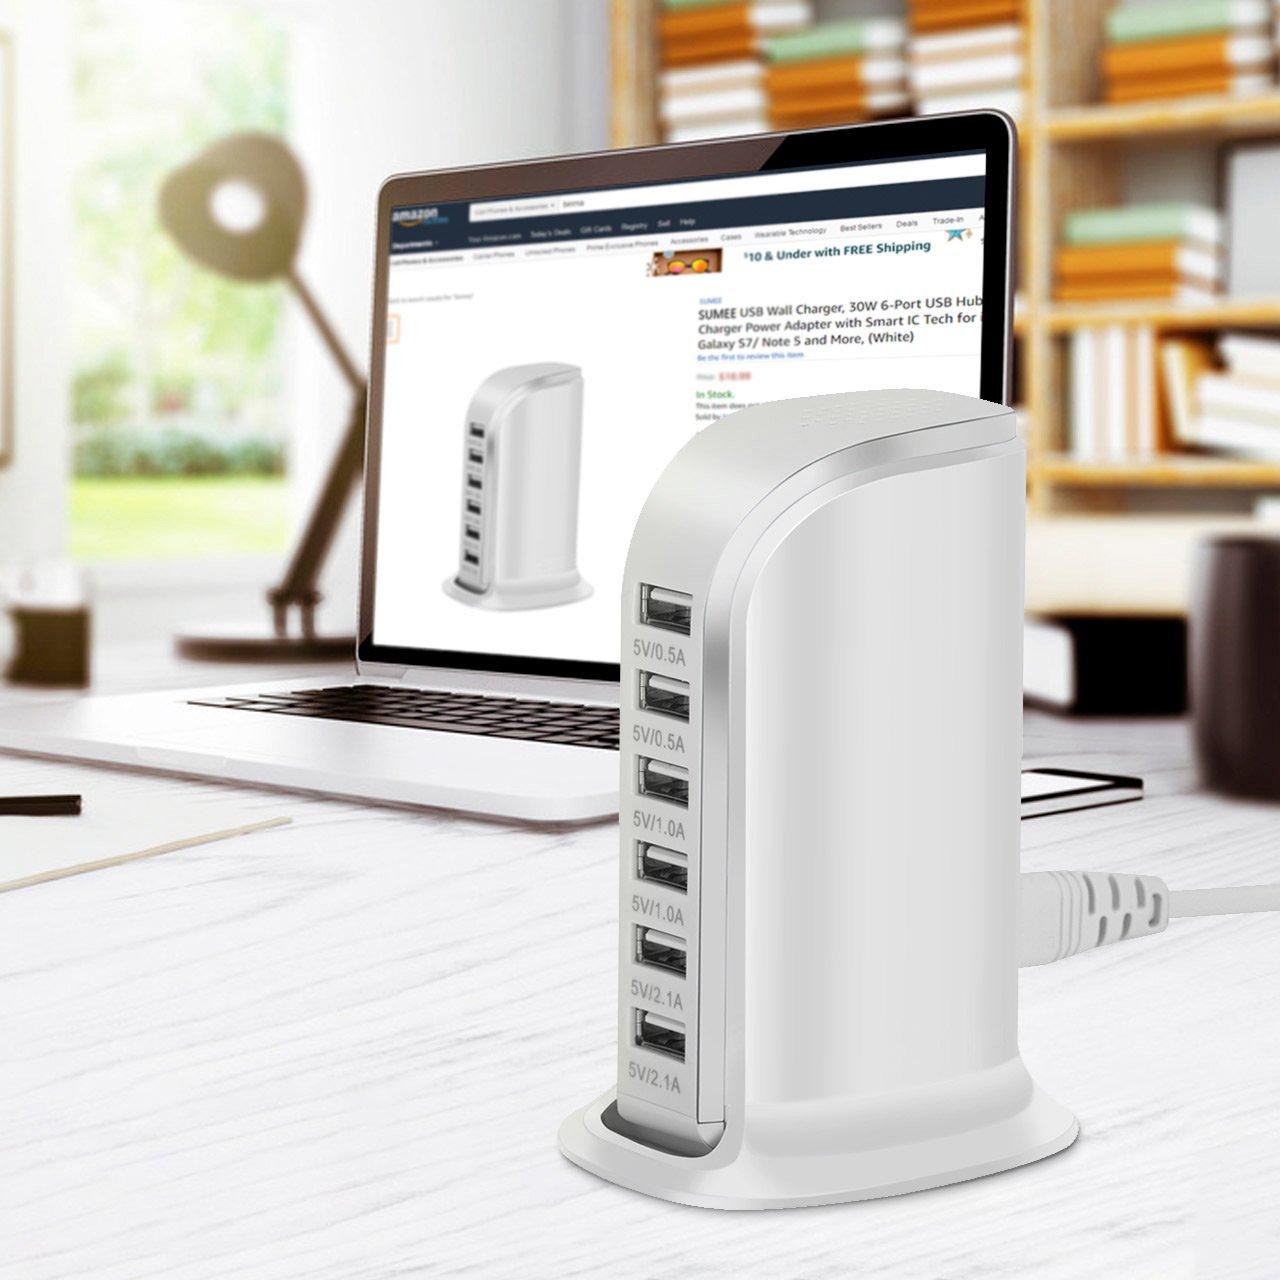 sumee usb wall charger 30w 6 port usb hub charging station desktop rh amazon com au